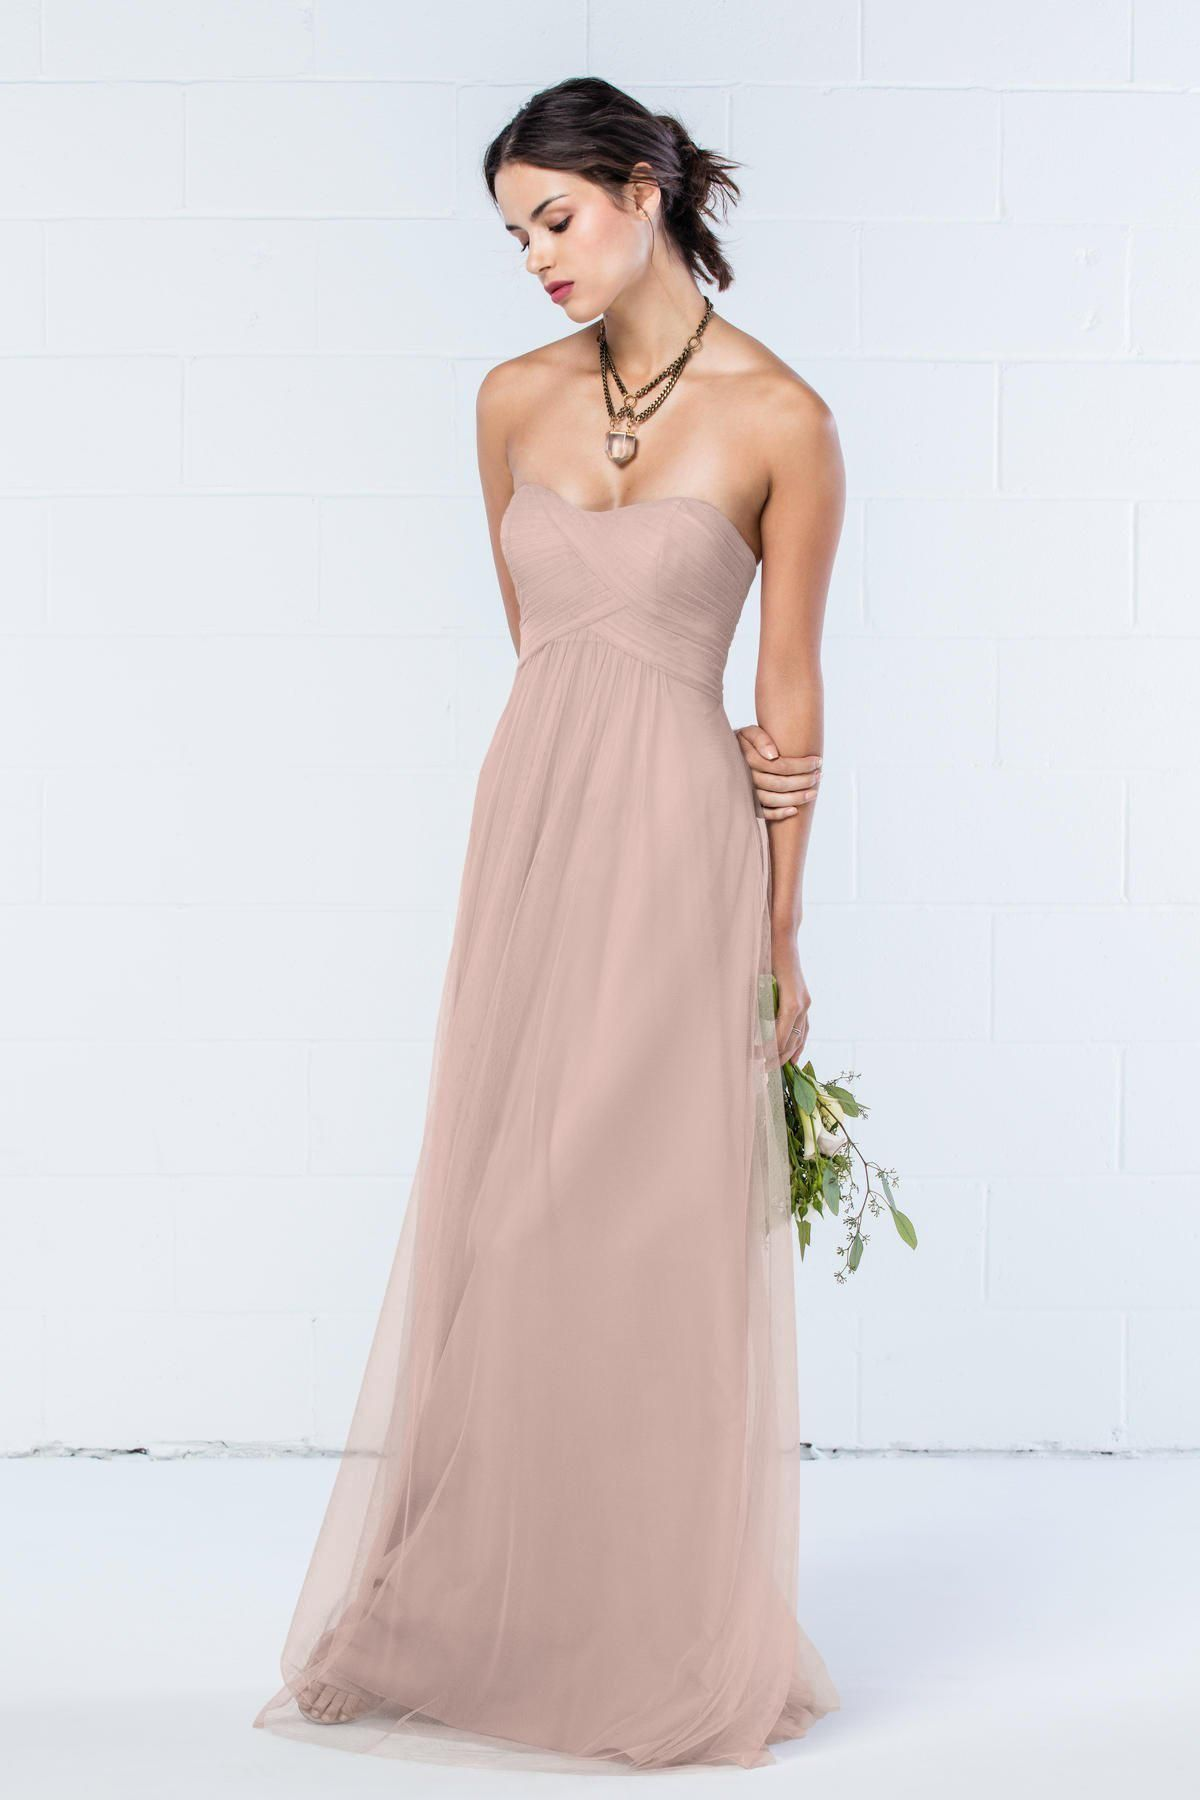 Excepcional Vestidos De Novia Usados ??mn Viñeta - Colección de ...